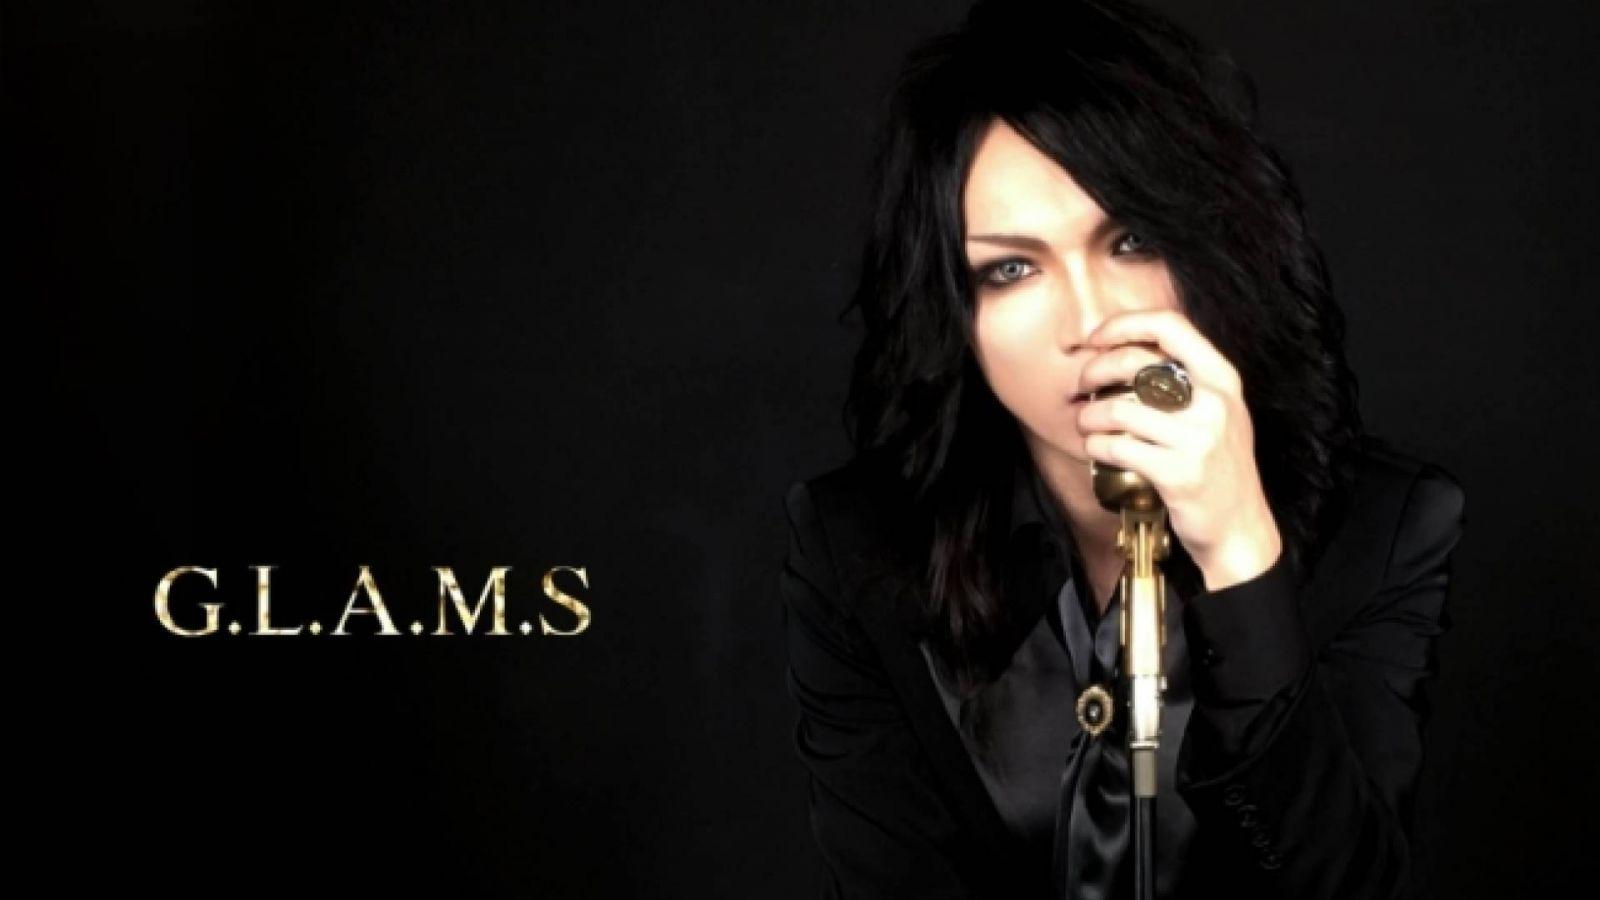 G.L.A.M.S. © Mikaru - G.L.A.M.S